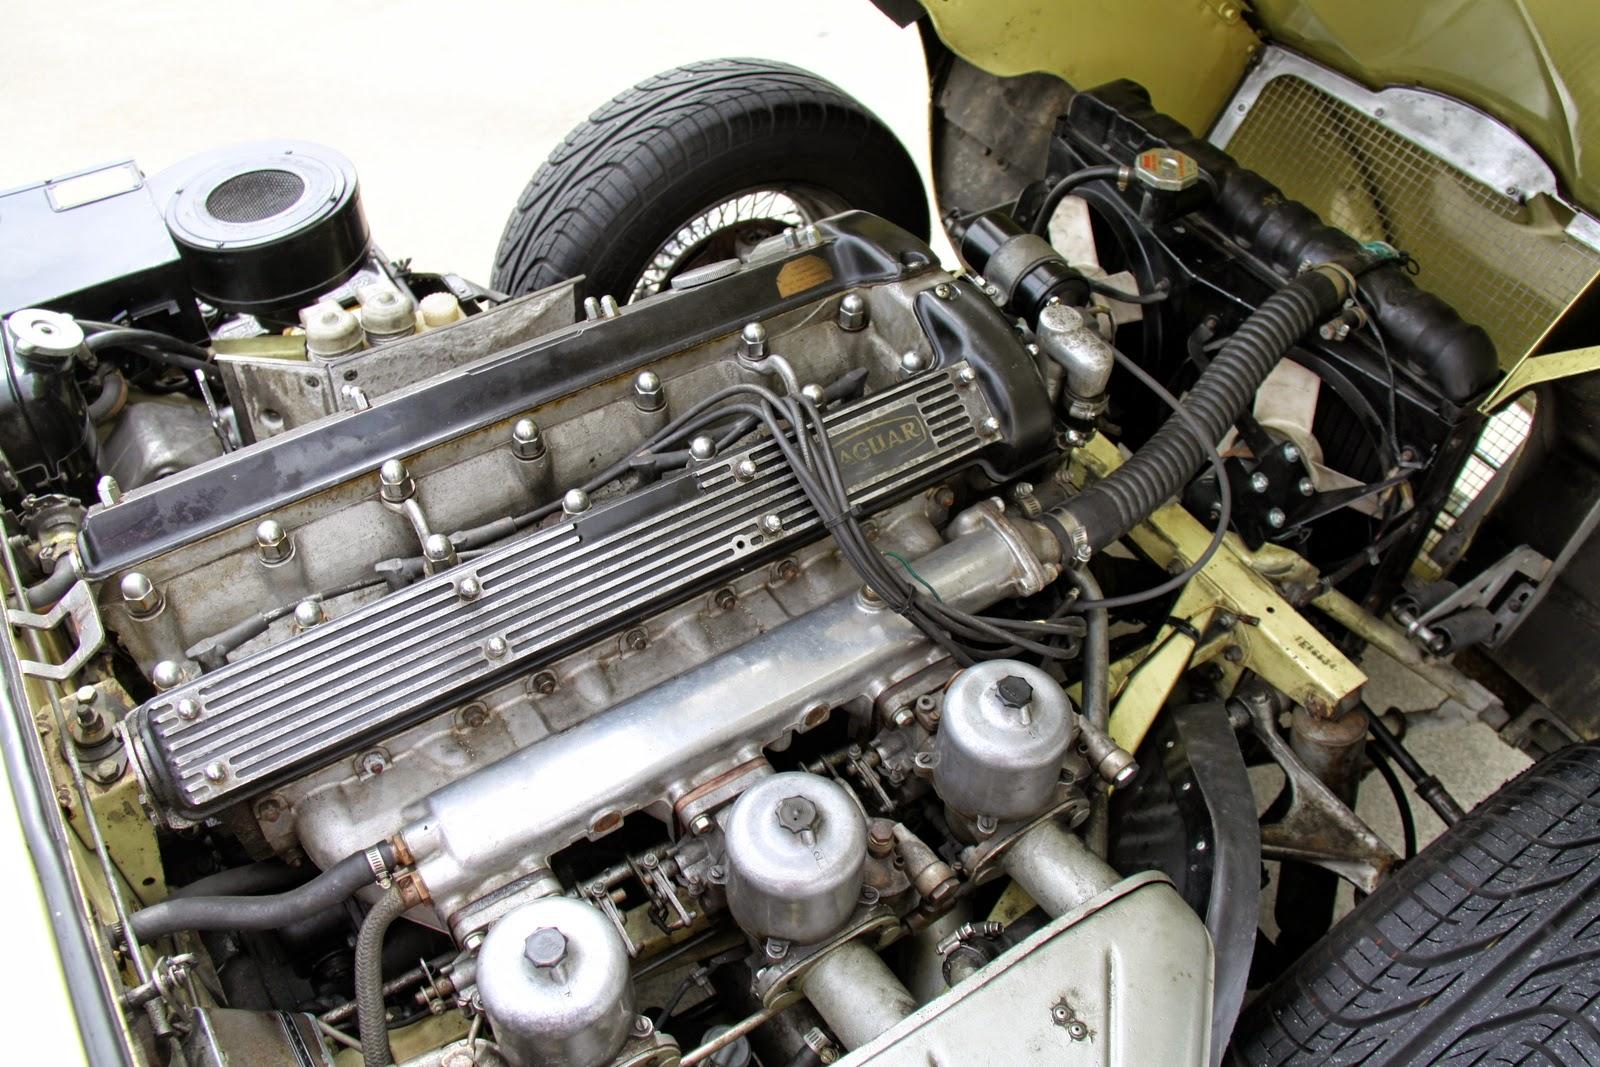 1968 jaguar e 4.2 series1.5